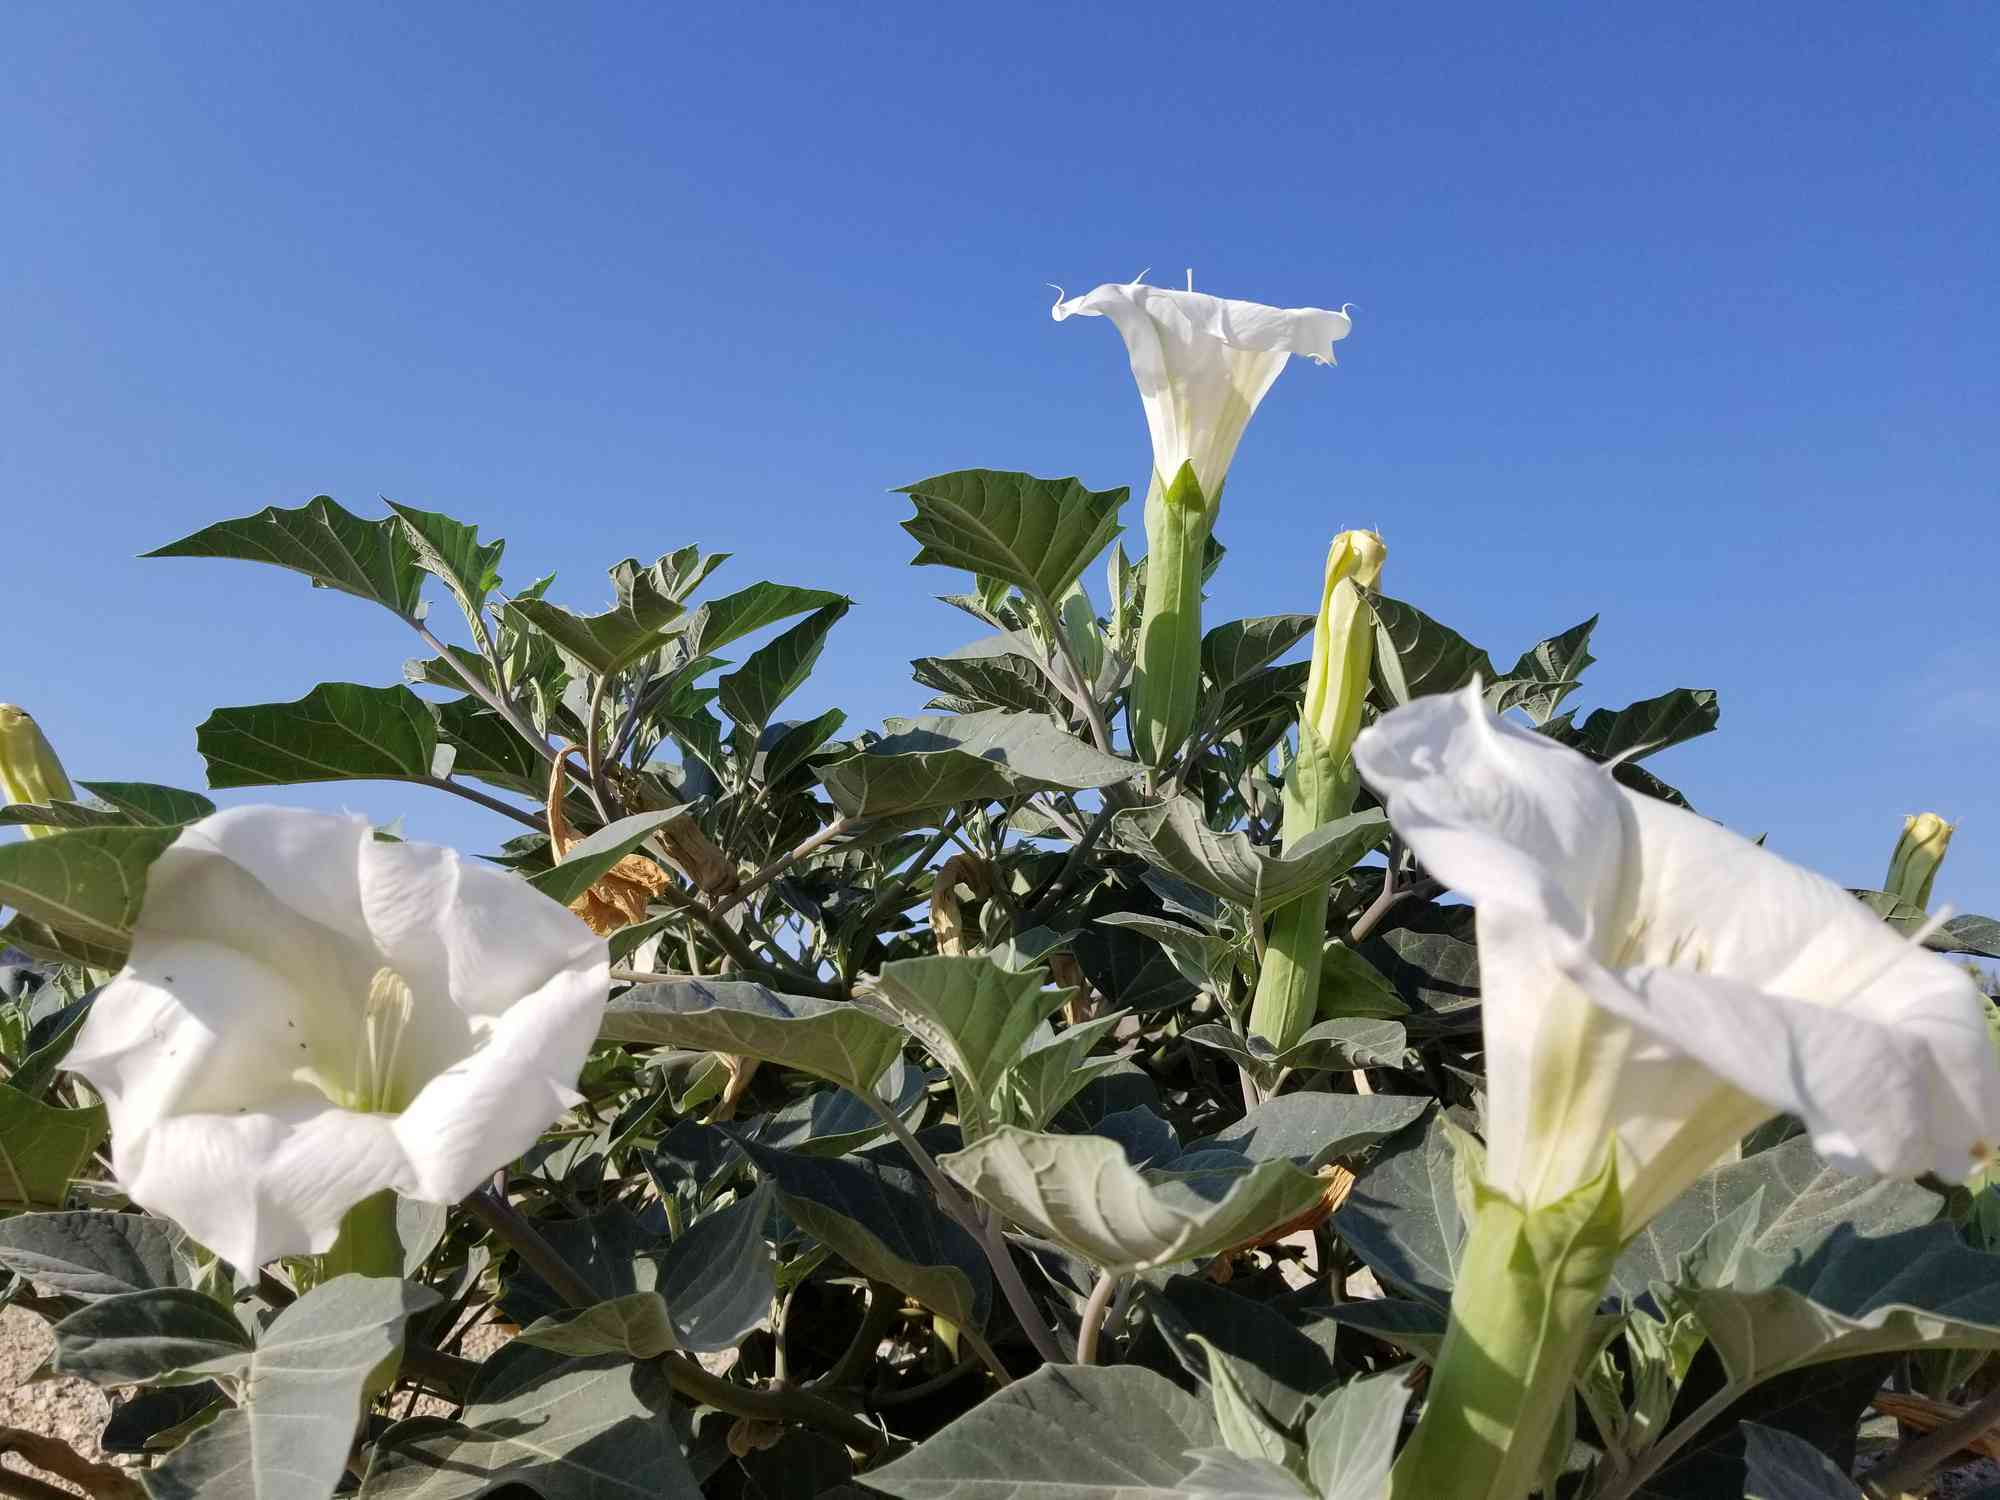 white Jimsonweed blooming in the desert